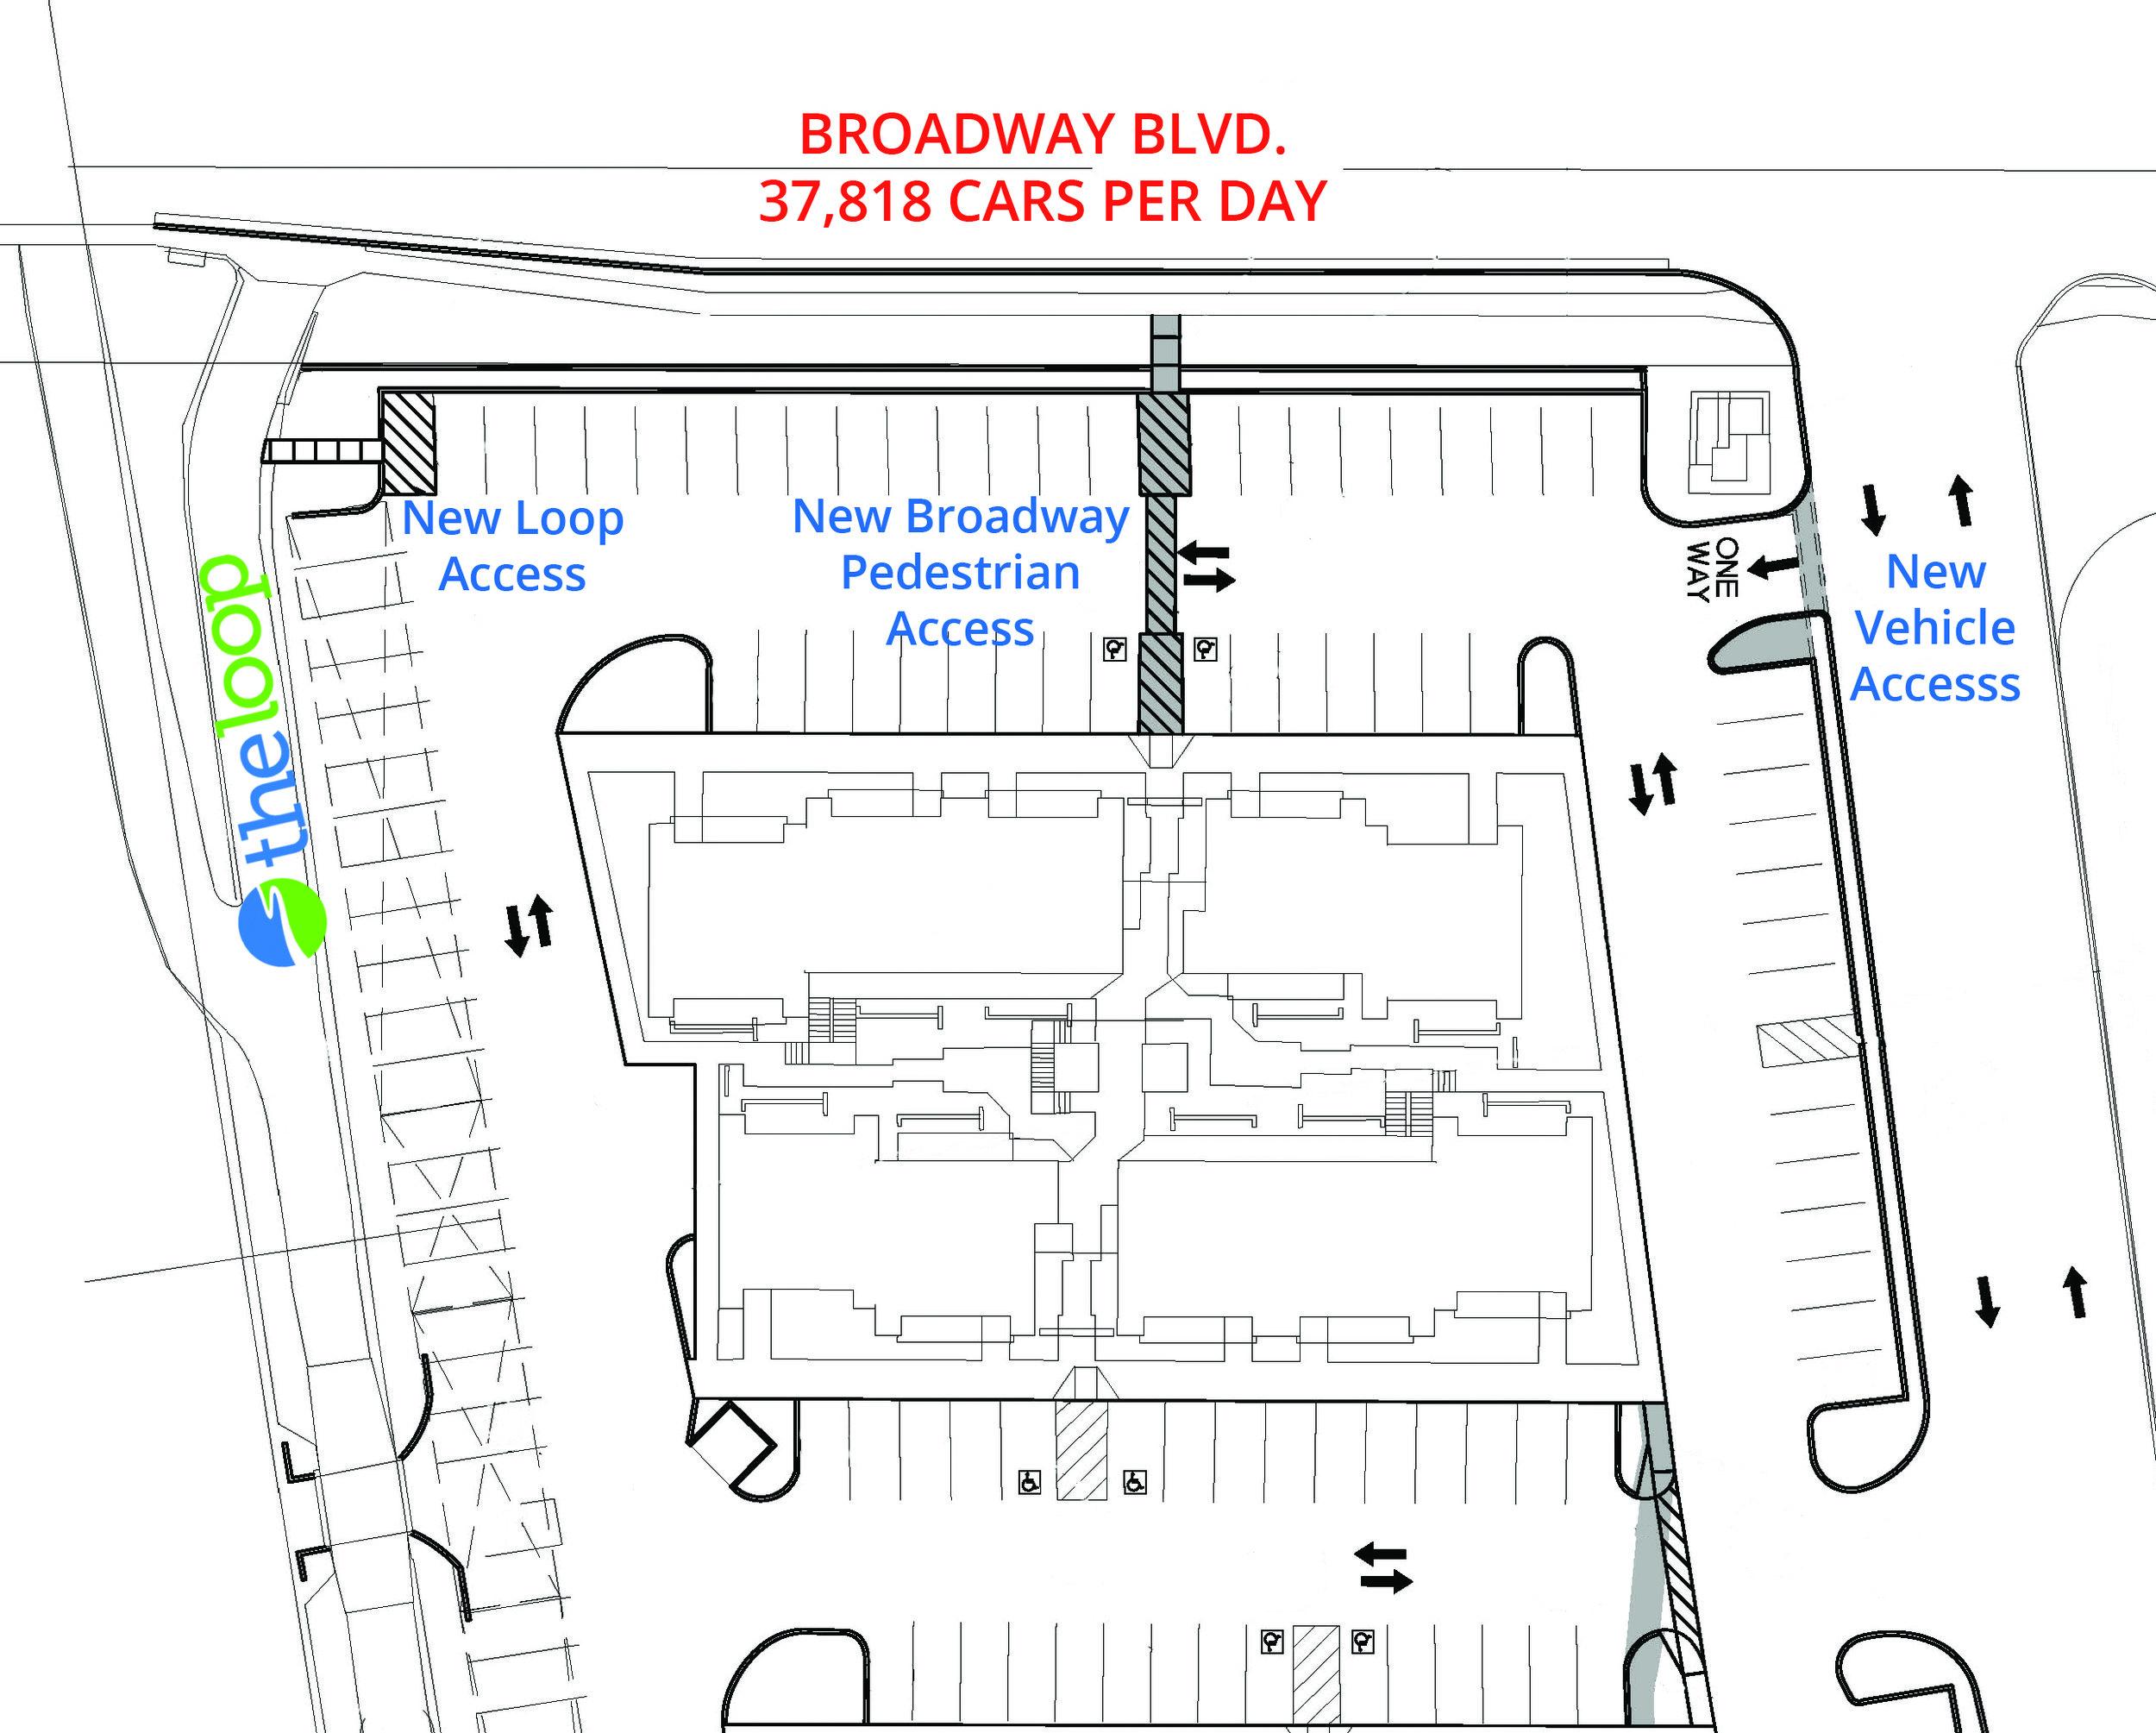 access imrpovements layout 11-21-18.jpg